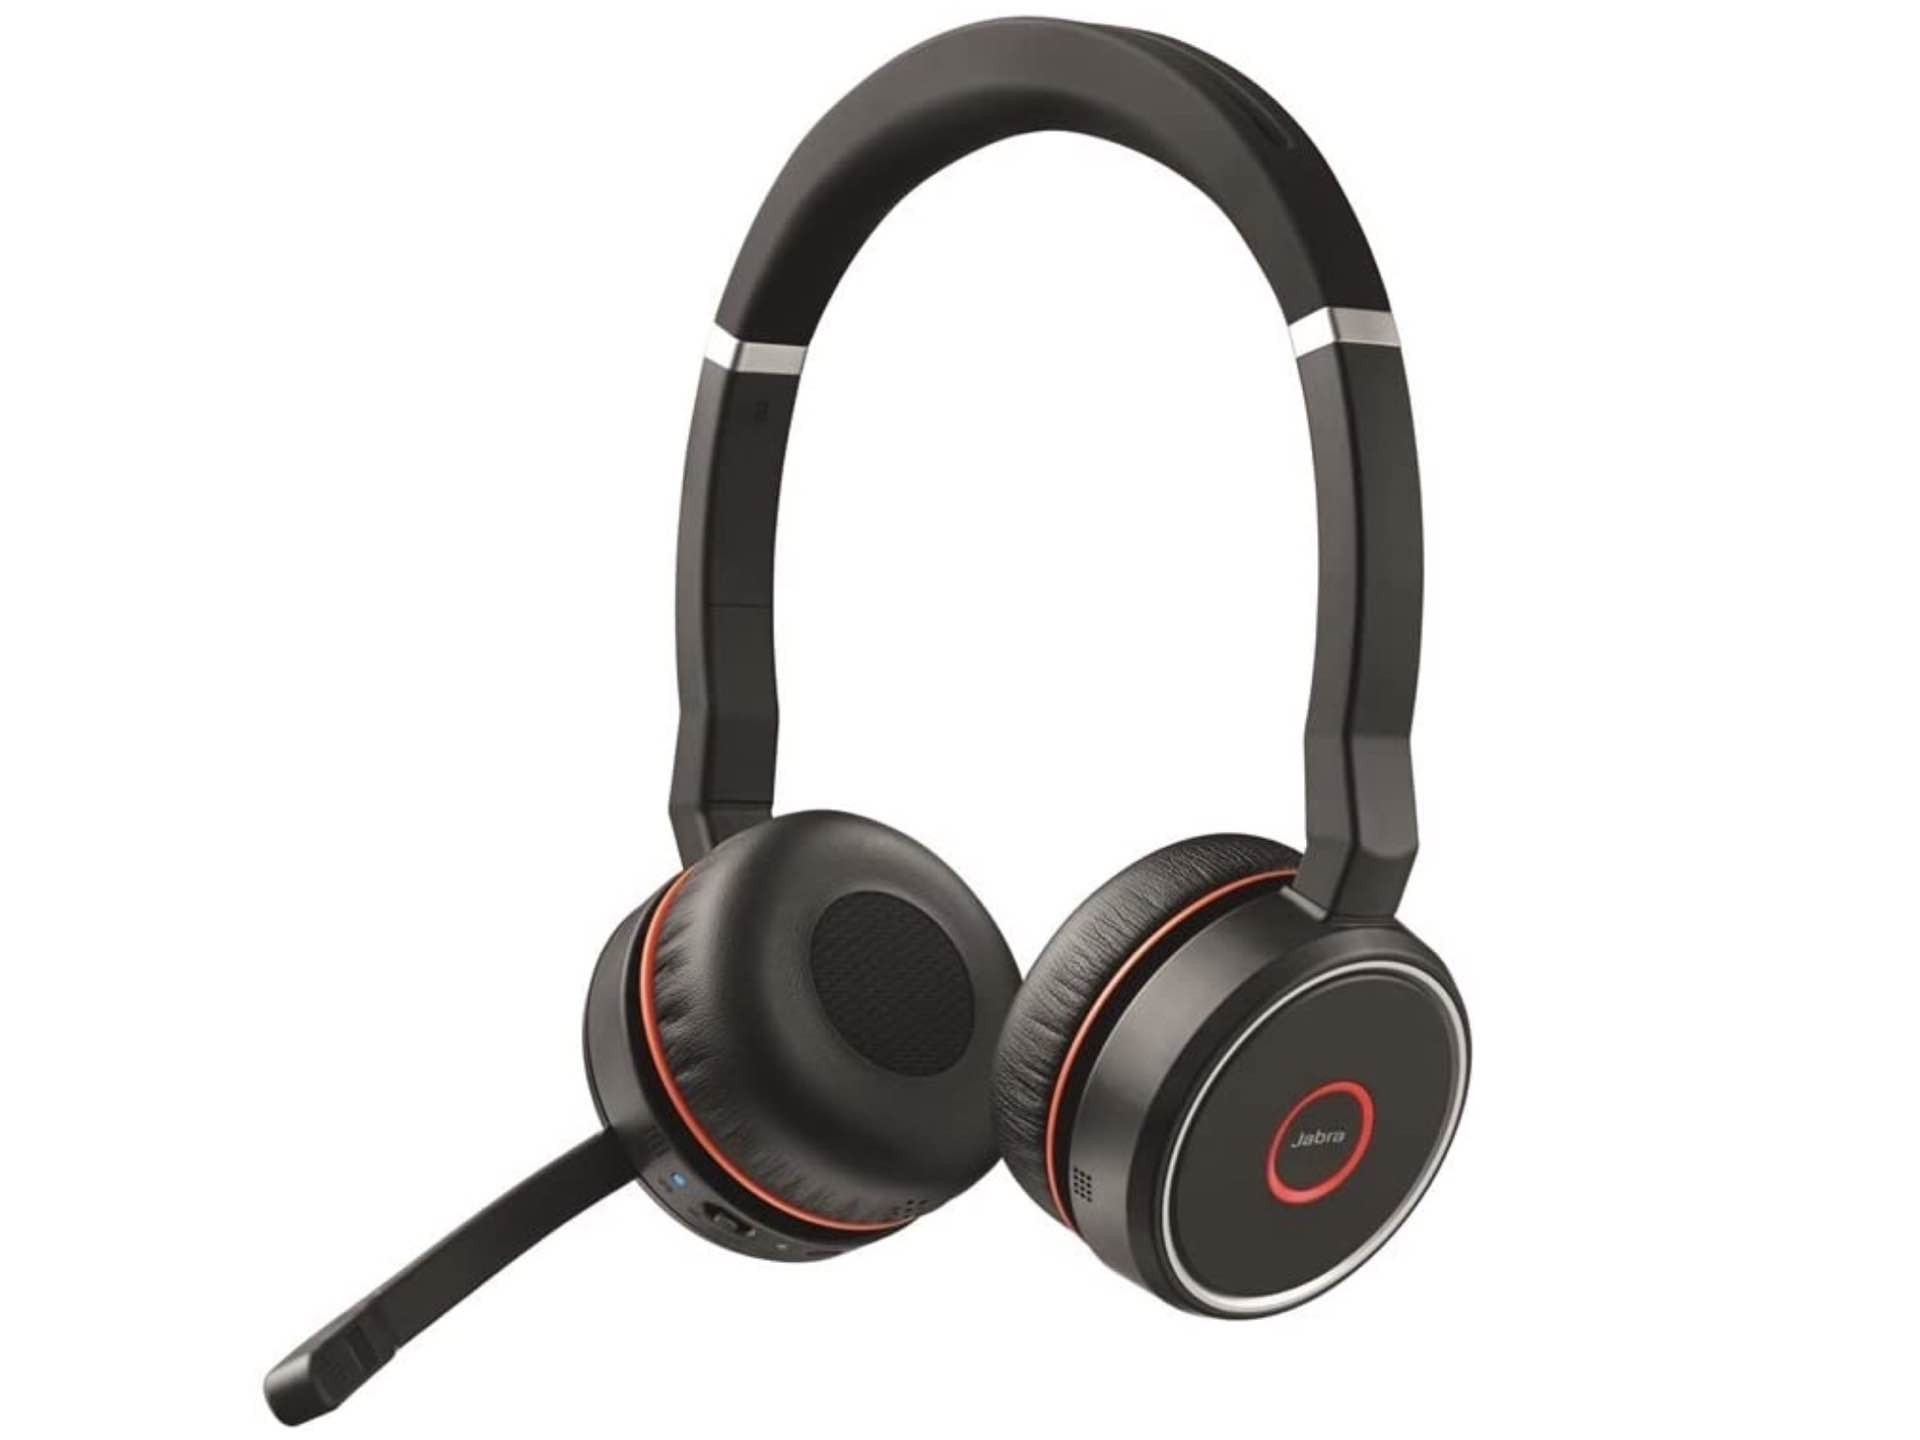 Jabra Evolve 75 telework headset. ($233)